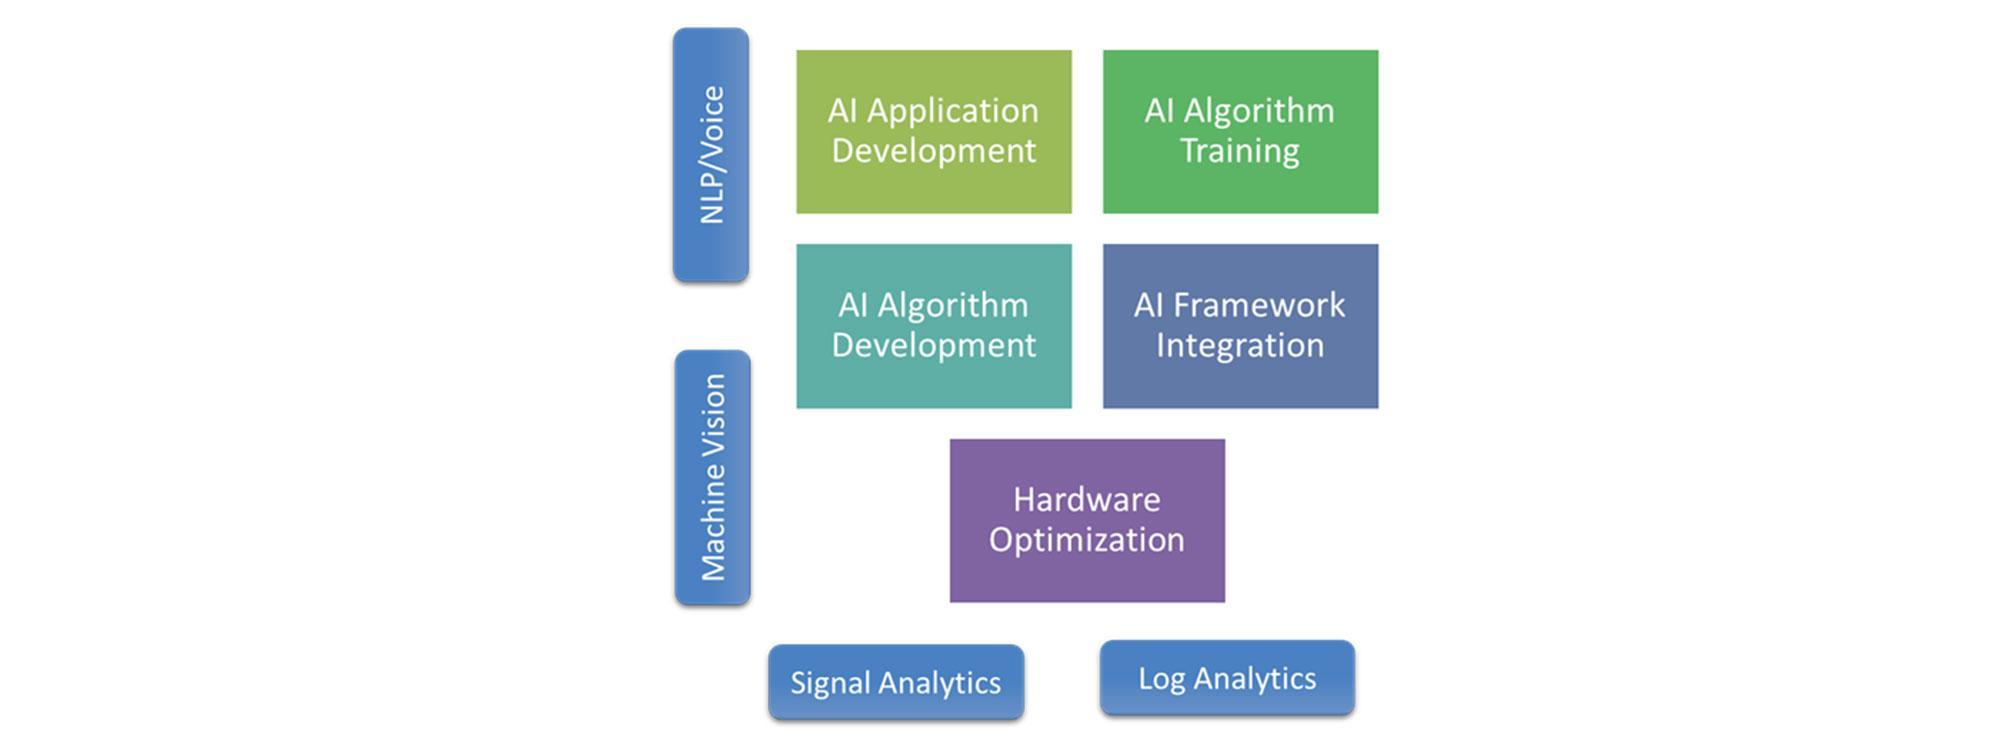 AI Tools & Frameworks